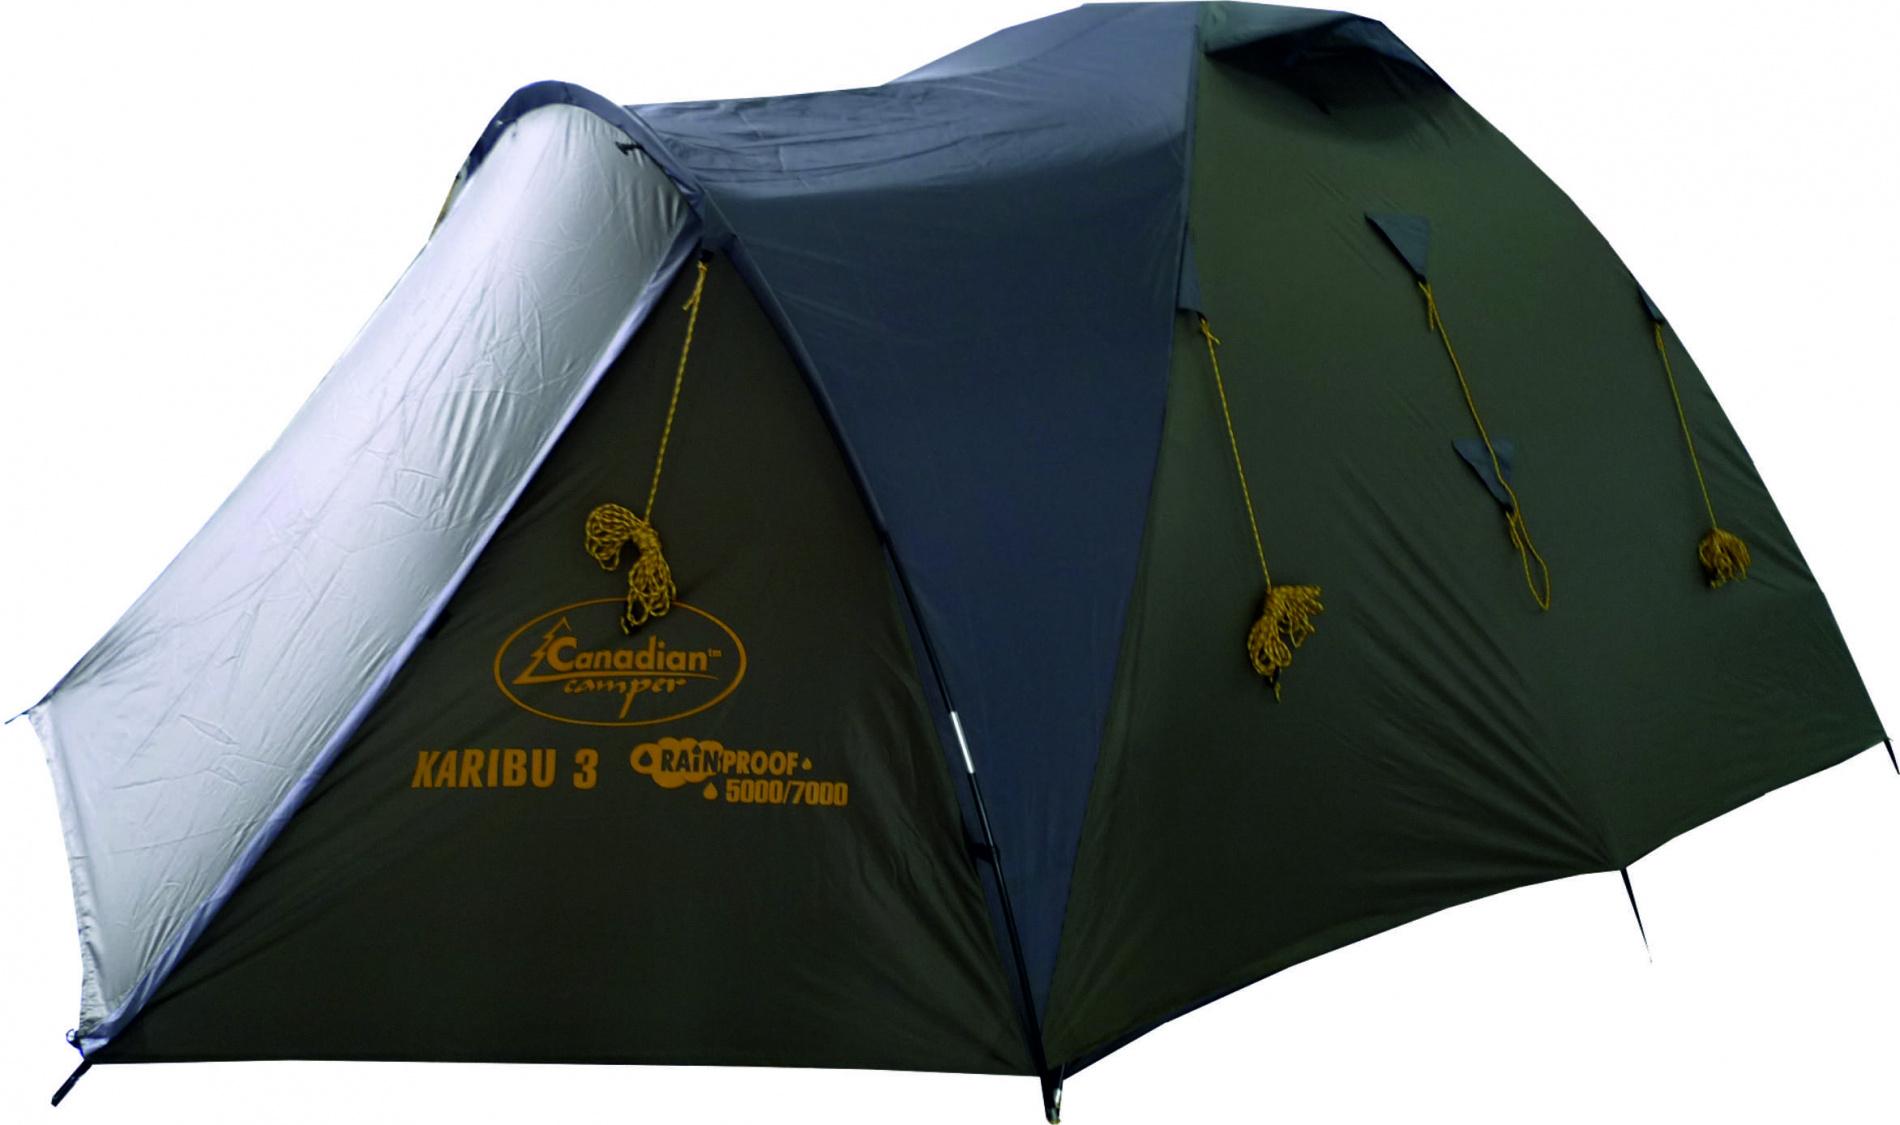 Палатка Canadian Camper KARIBU 3 (цвет forest дуги 9,5 мм)Палатки<br>Палатка KARIBU 3 (цвет forest дуги 9,5 мм)<br><br>Цвет: зеленый